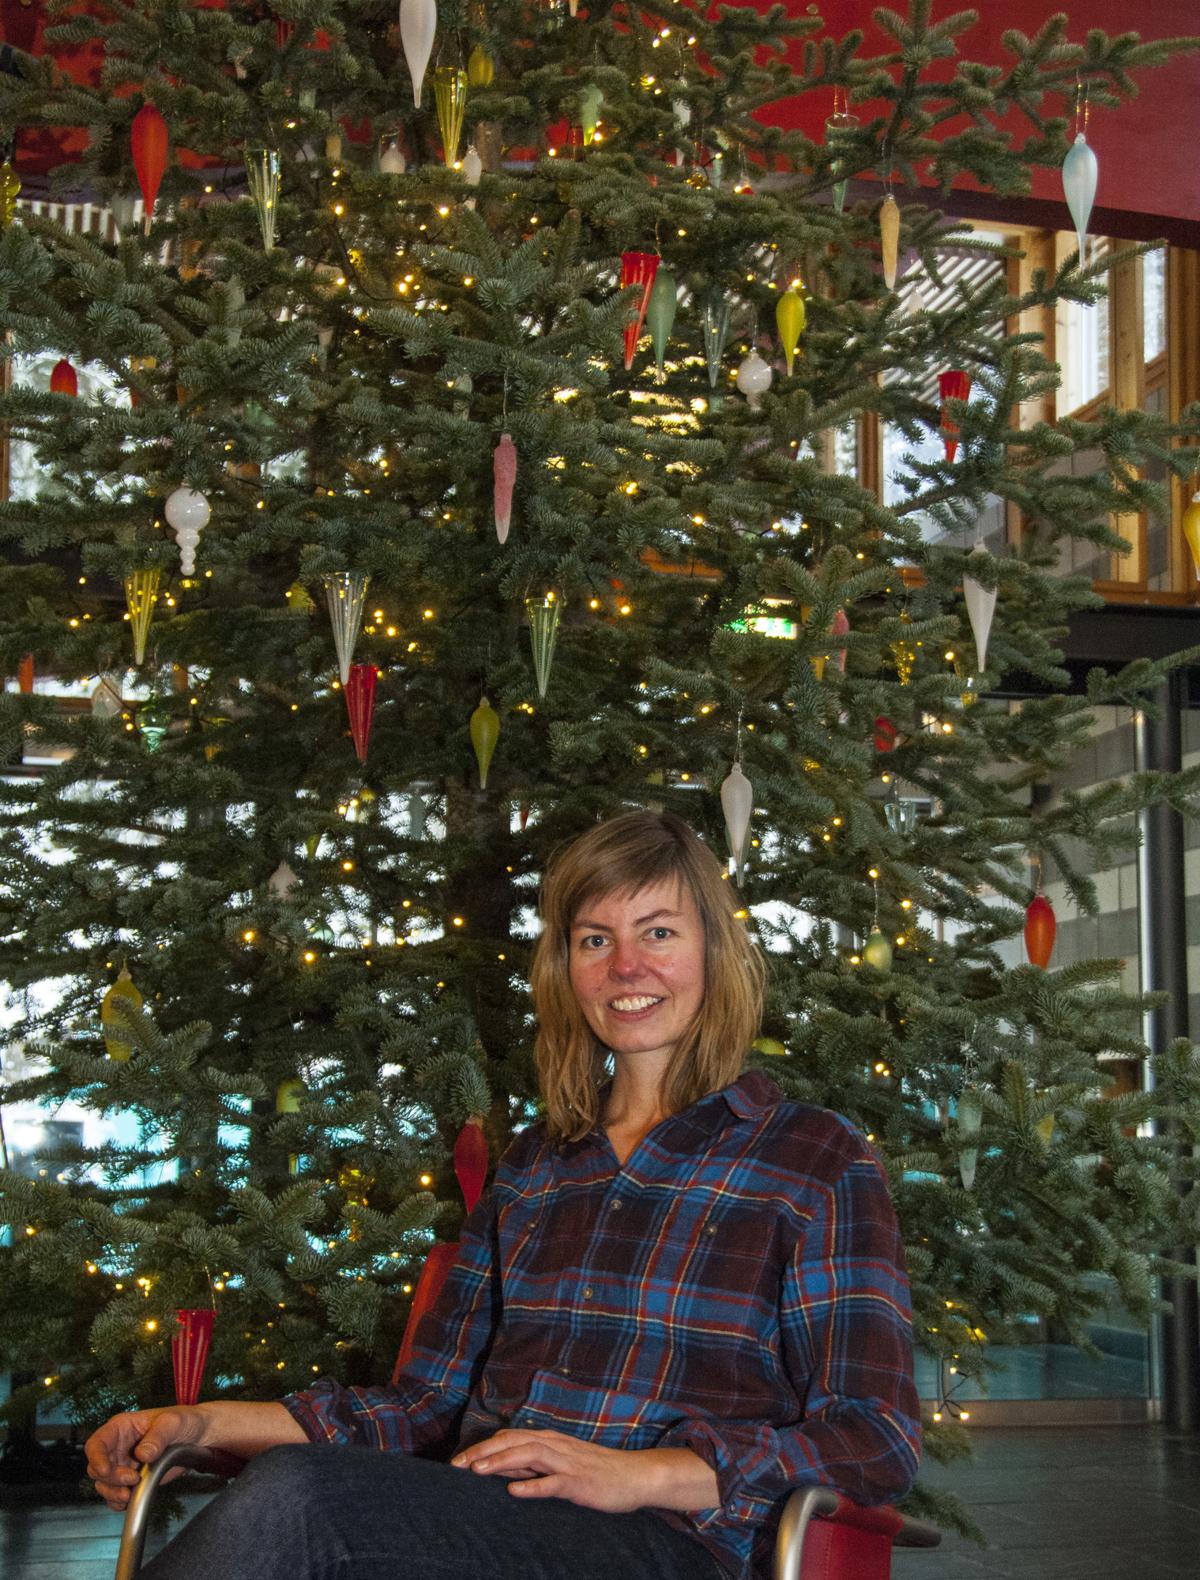 Kari Mølstad foran juletre med glasspynt i ulike farger.